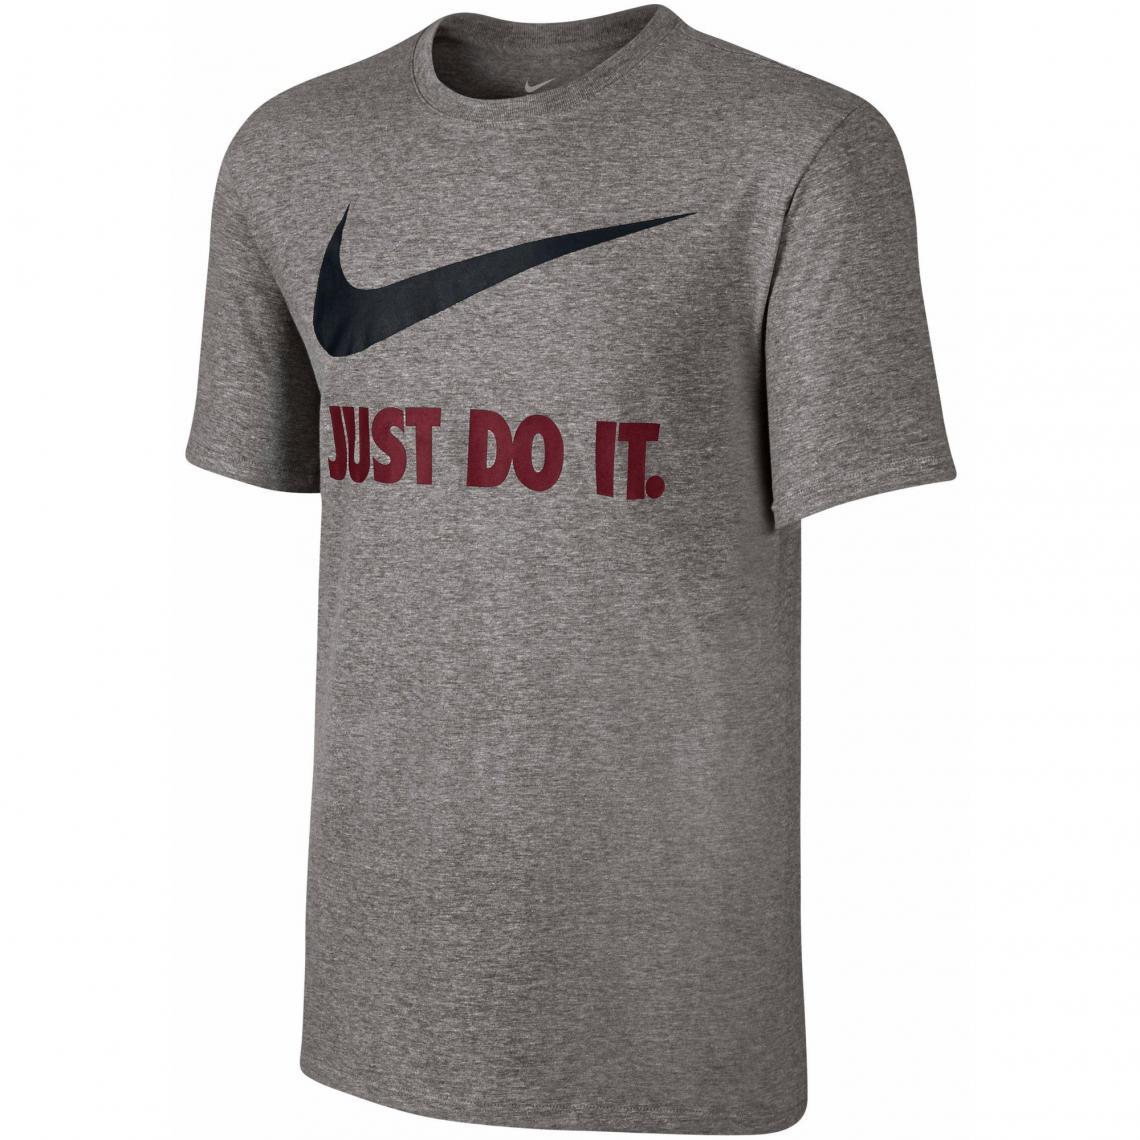 Homme 3suisses Manches T Shirt Swoosh Do Just Rond Courtes Col It XwZtZqv